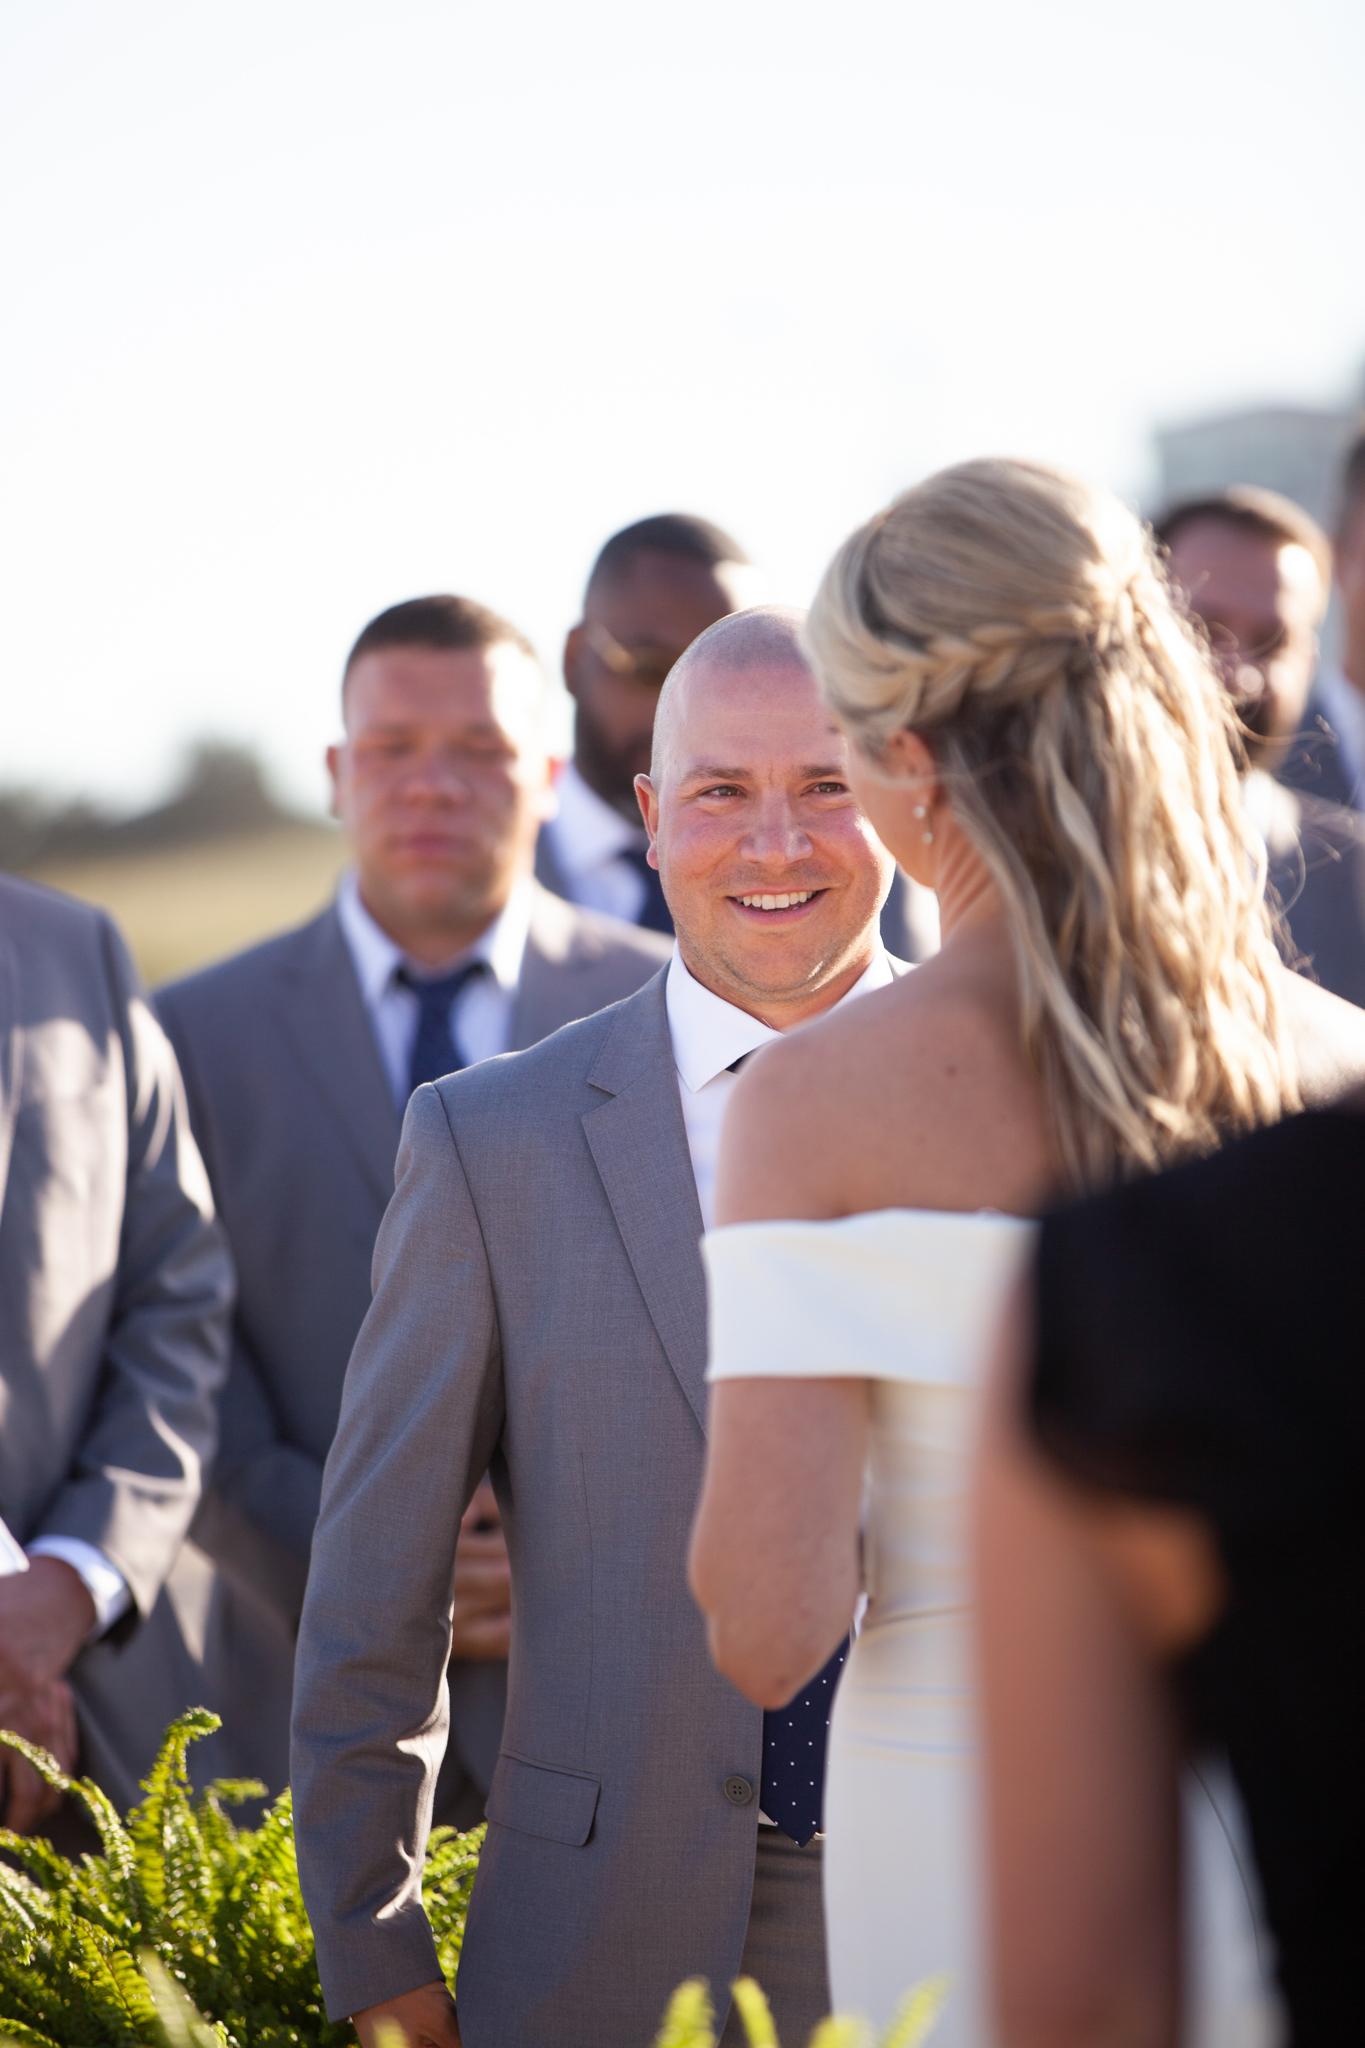 maine-wedding-photographer-ocean-park-stepheneycollinsphotography-155.jpg